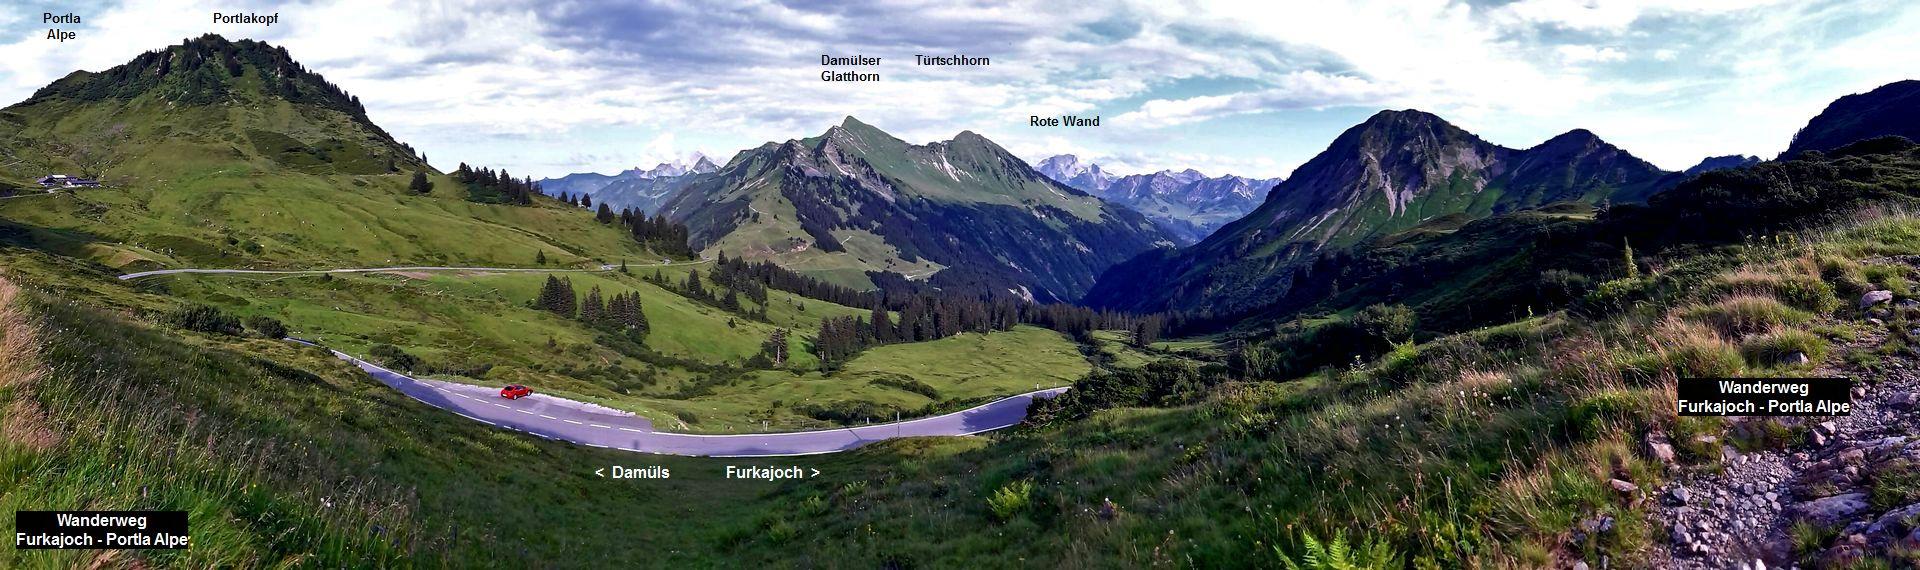 Portla Alpe, Portlakopf und Damuelser Glatthorn vom  Wanderweg oberhalb der Passstrasse Damuels-Furkajoch